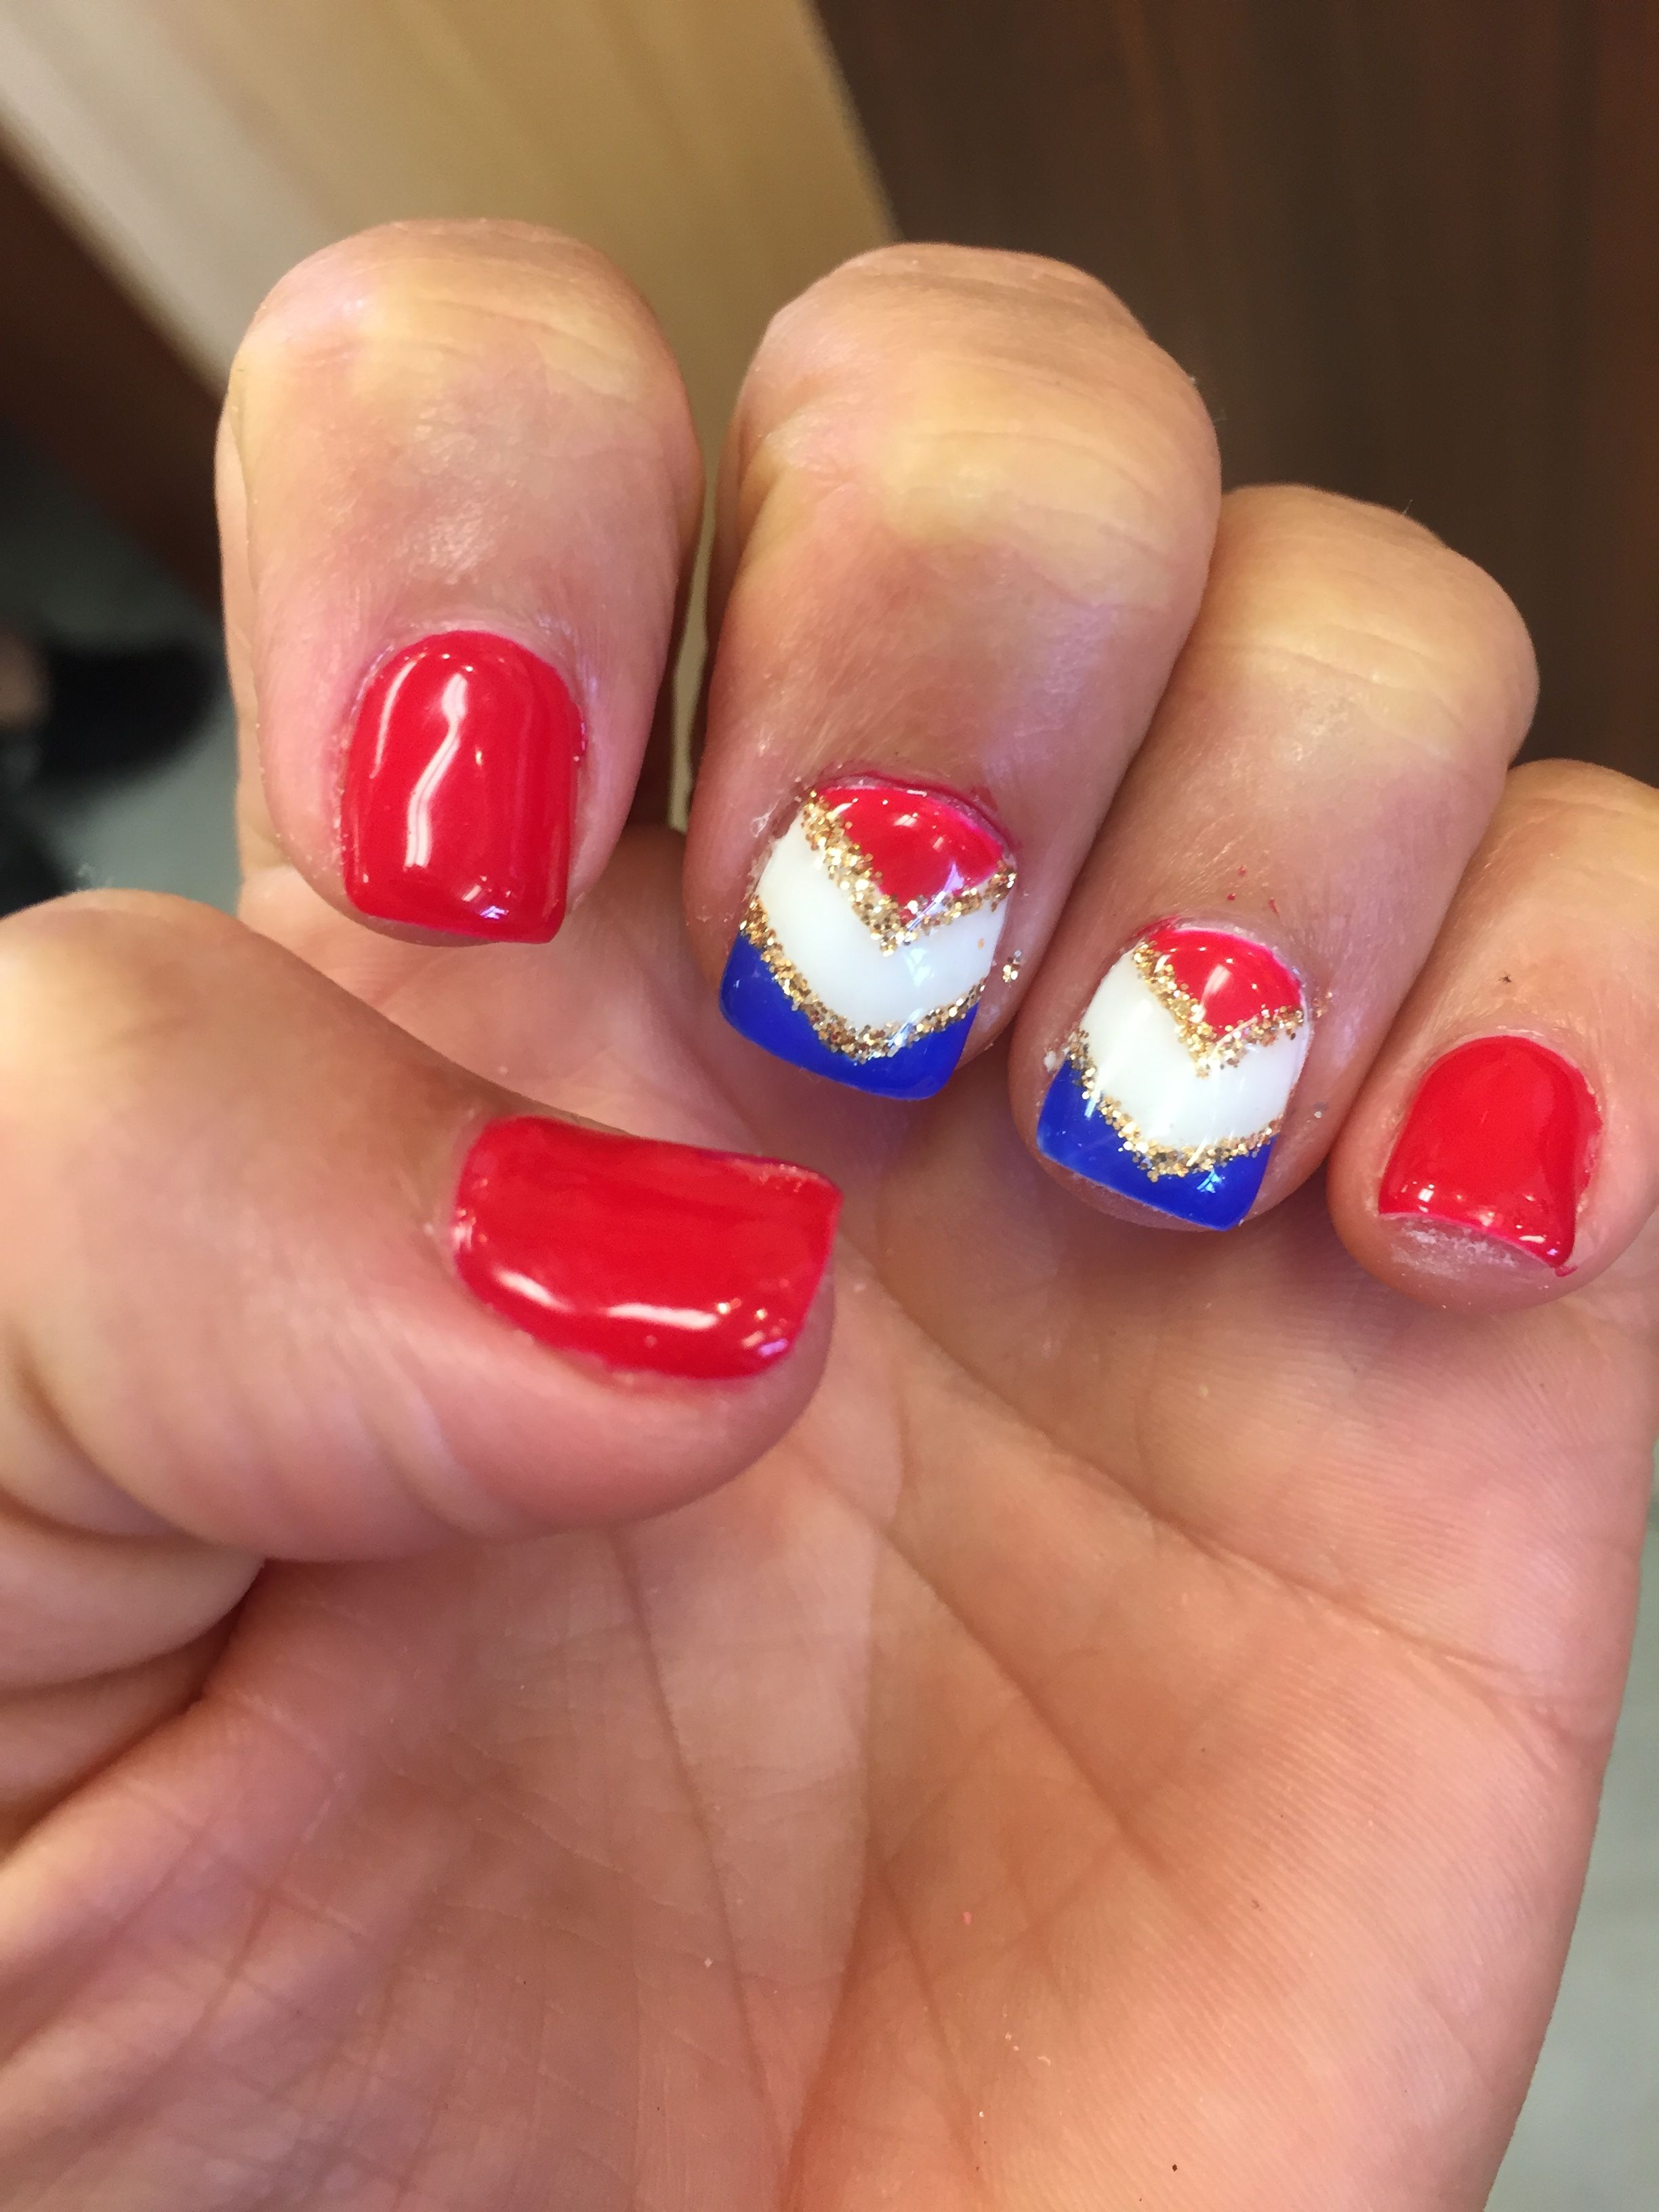 Memorial Day July 4th America Nail Design Shellac Gel Polish Red